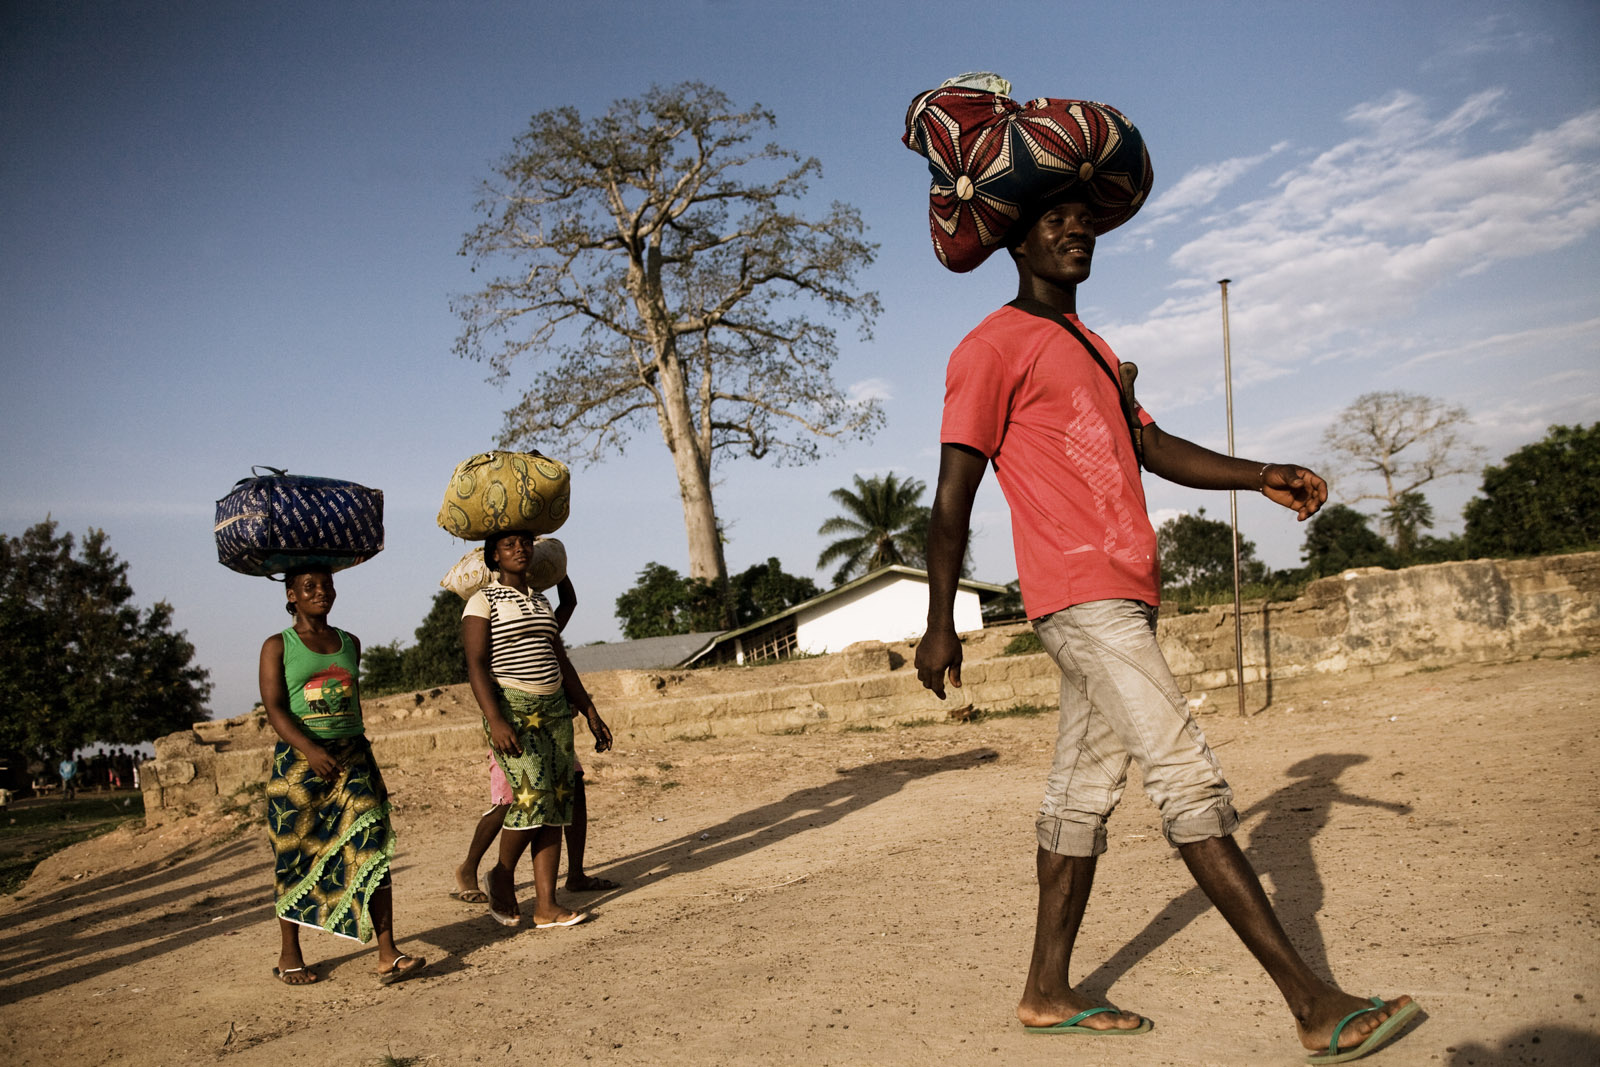 liberia-refugies-ivoiriens-0311-9878hd